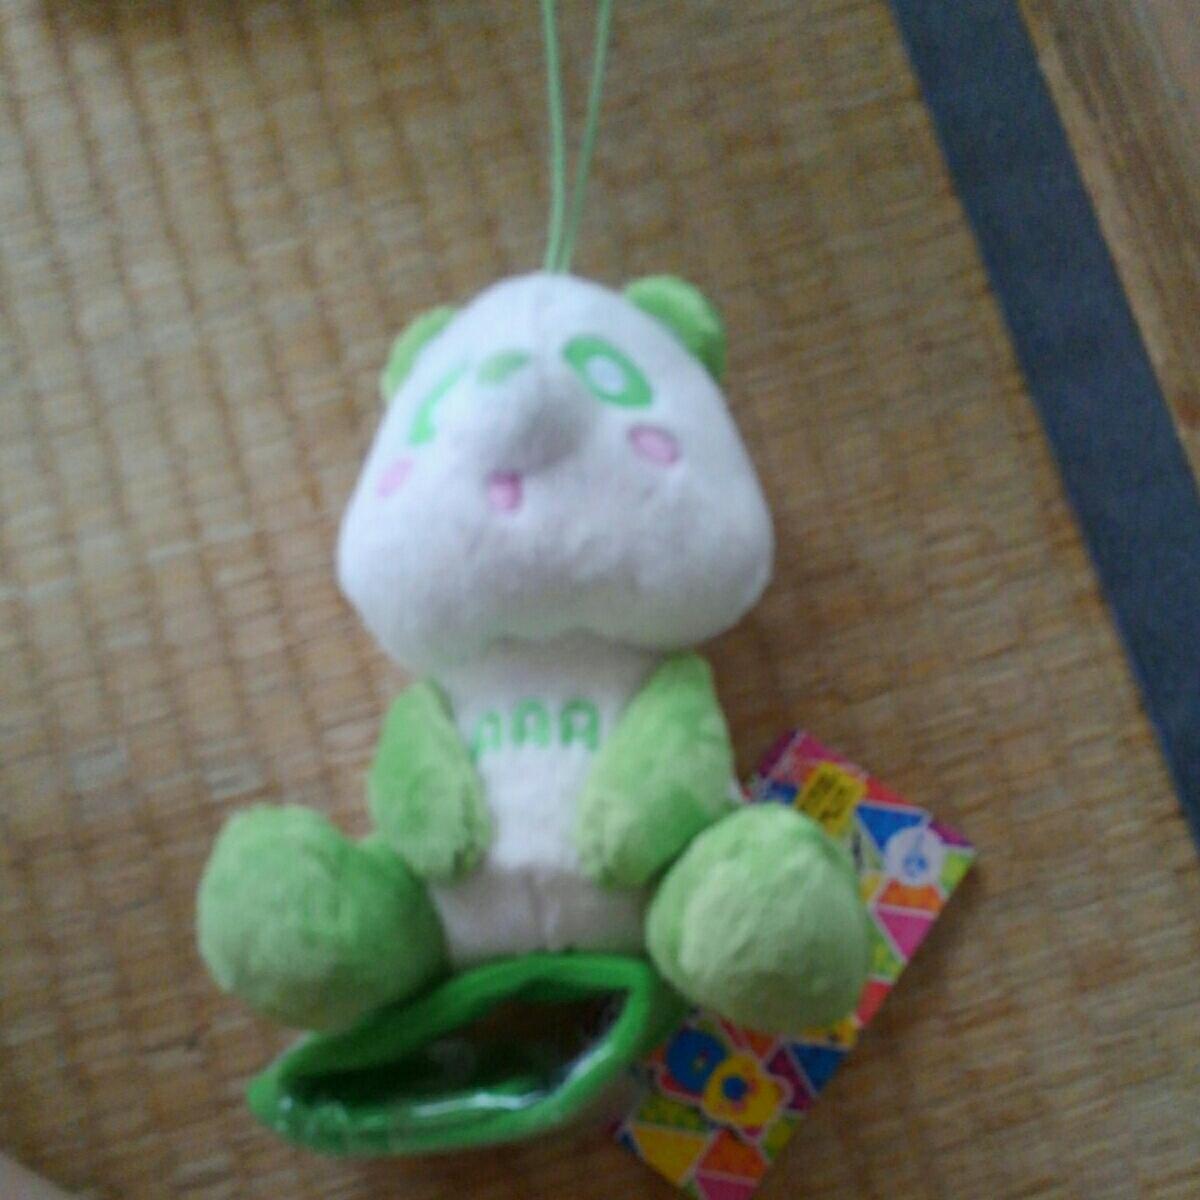 AAA え~パンダ 肩のりぬいぐるみ グリーン 緑 送料220円 新品